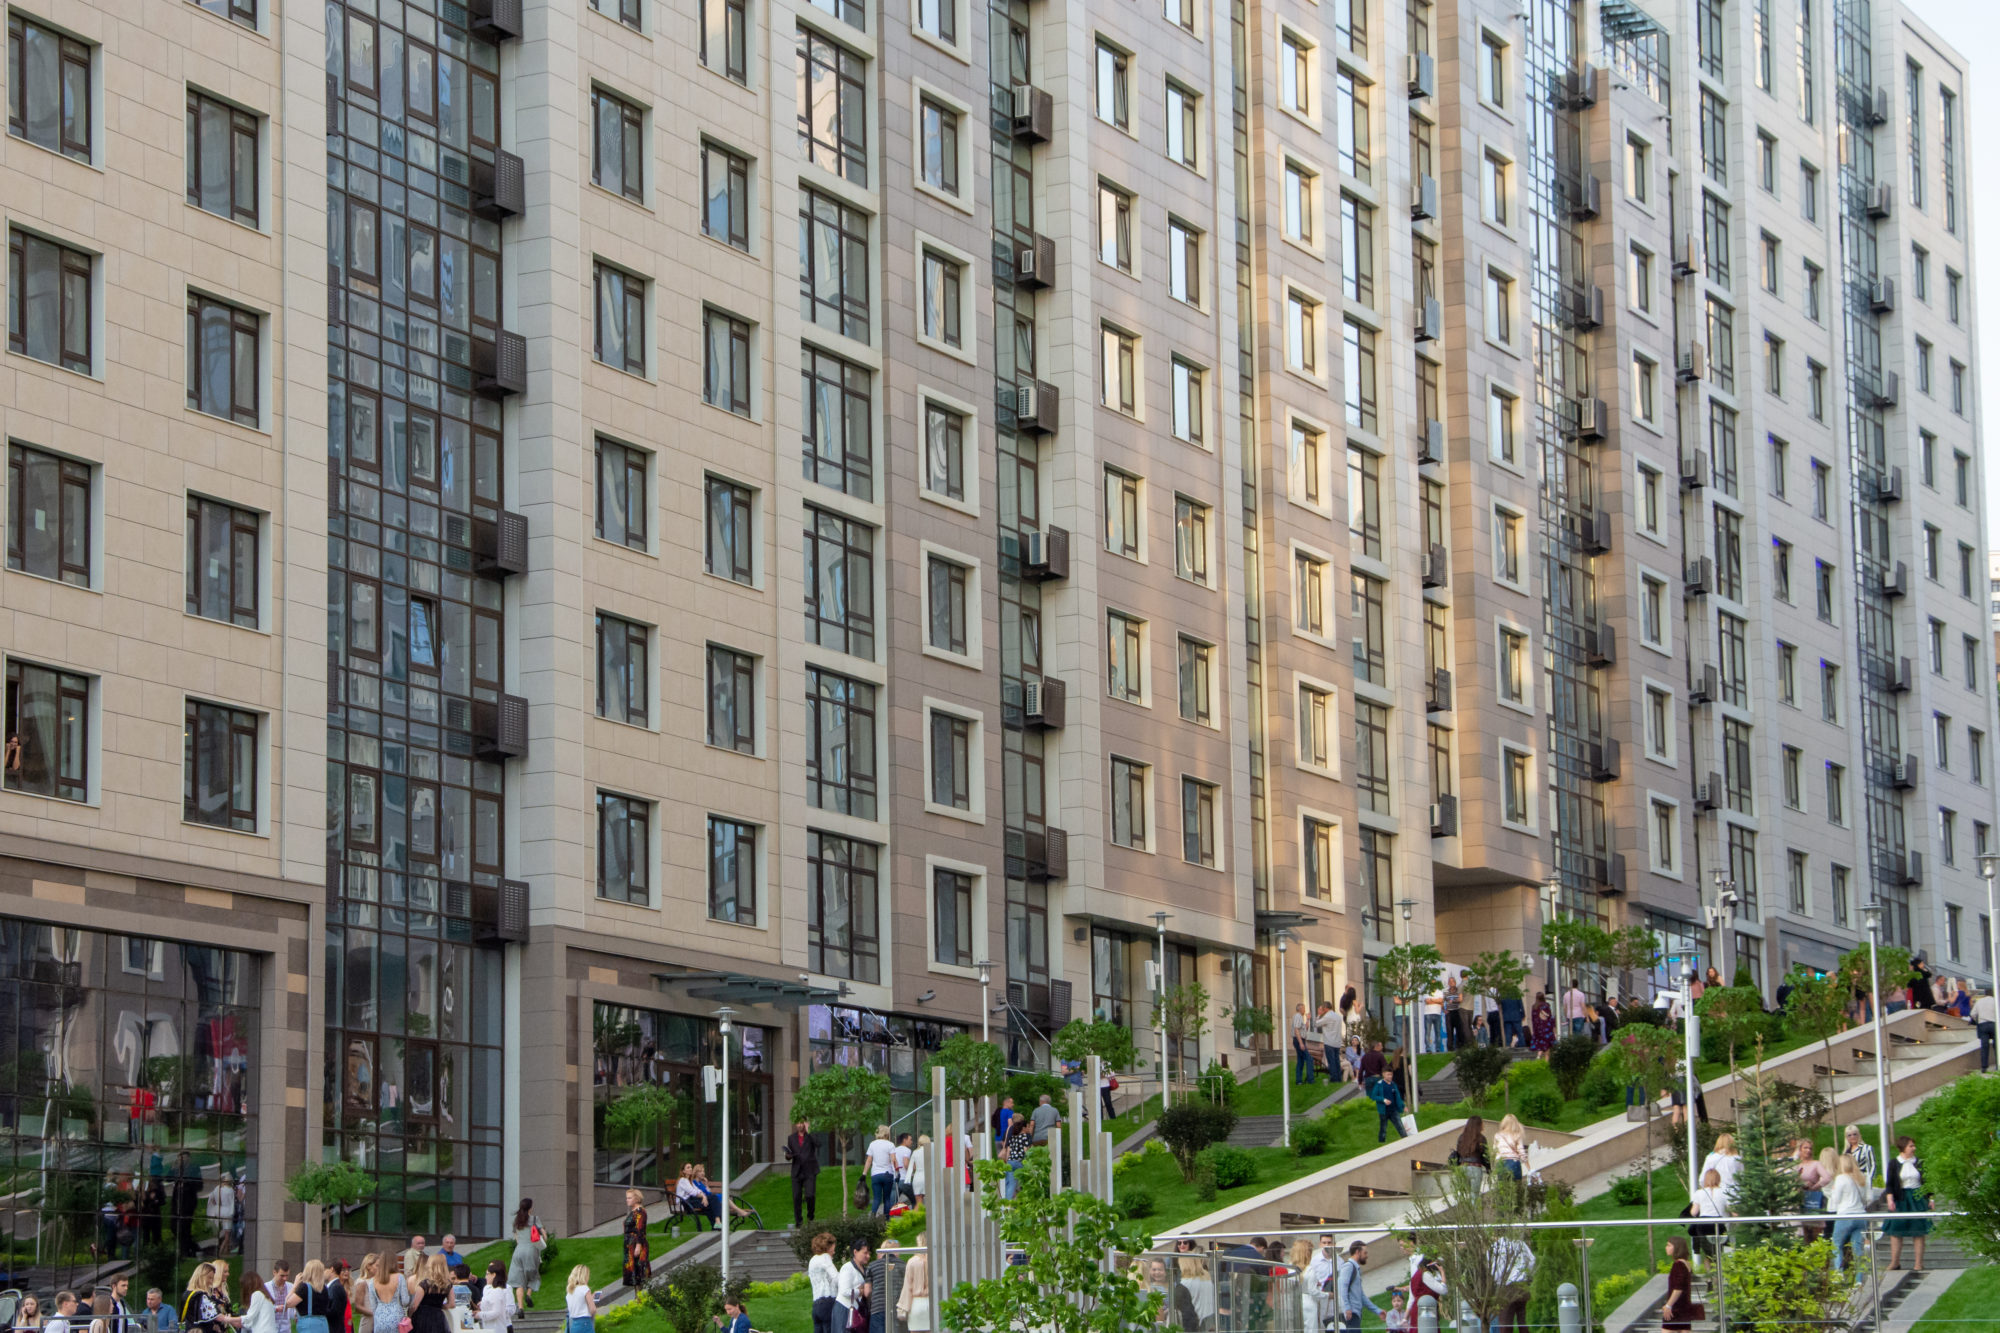 ЖК Бульвар фонтанов Фасады АМТТ